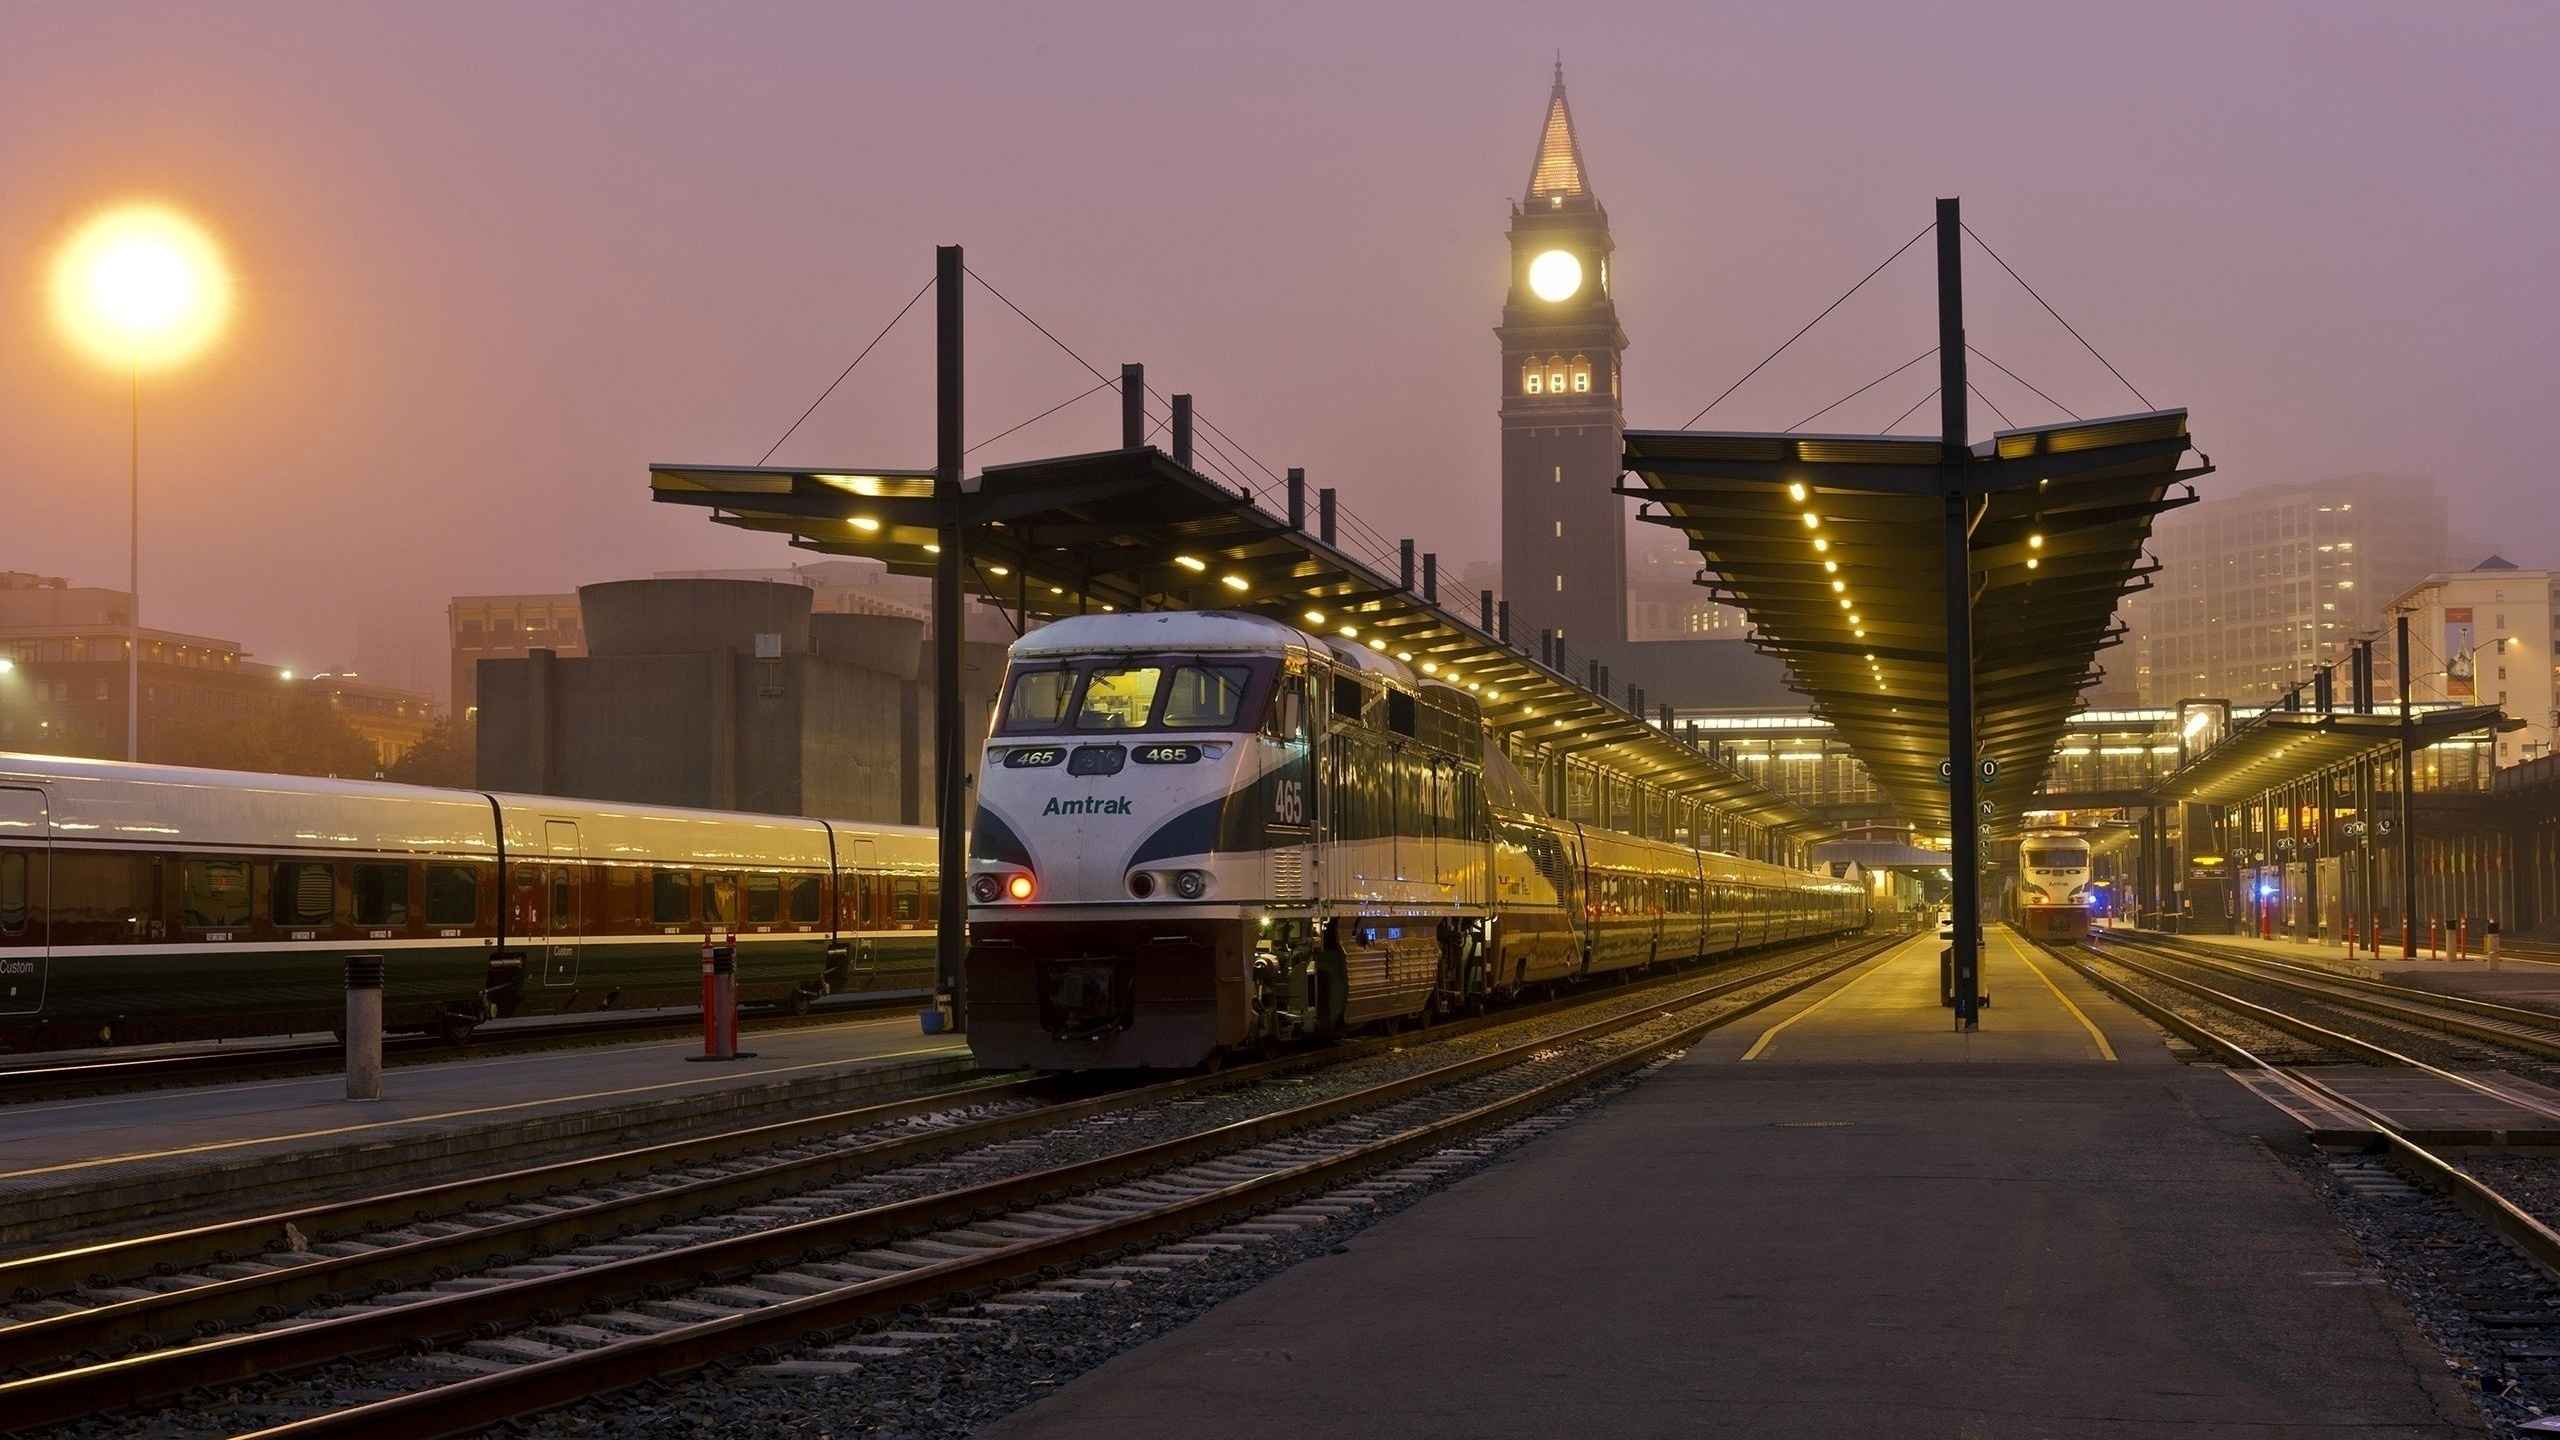 срок става поезда на вокзале обои и картинки она